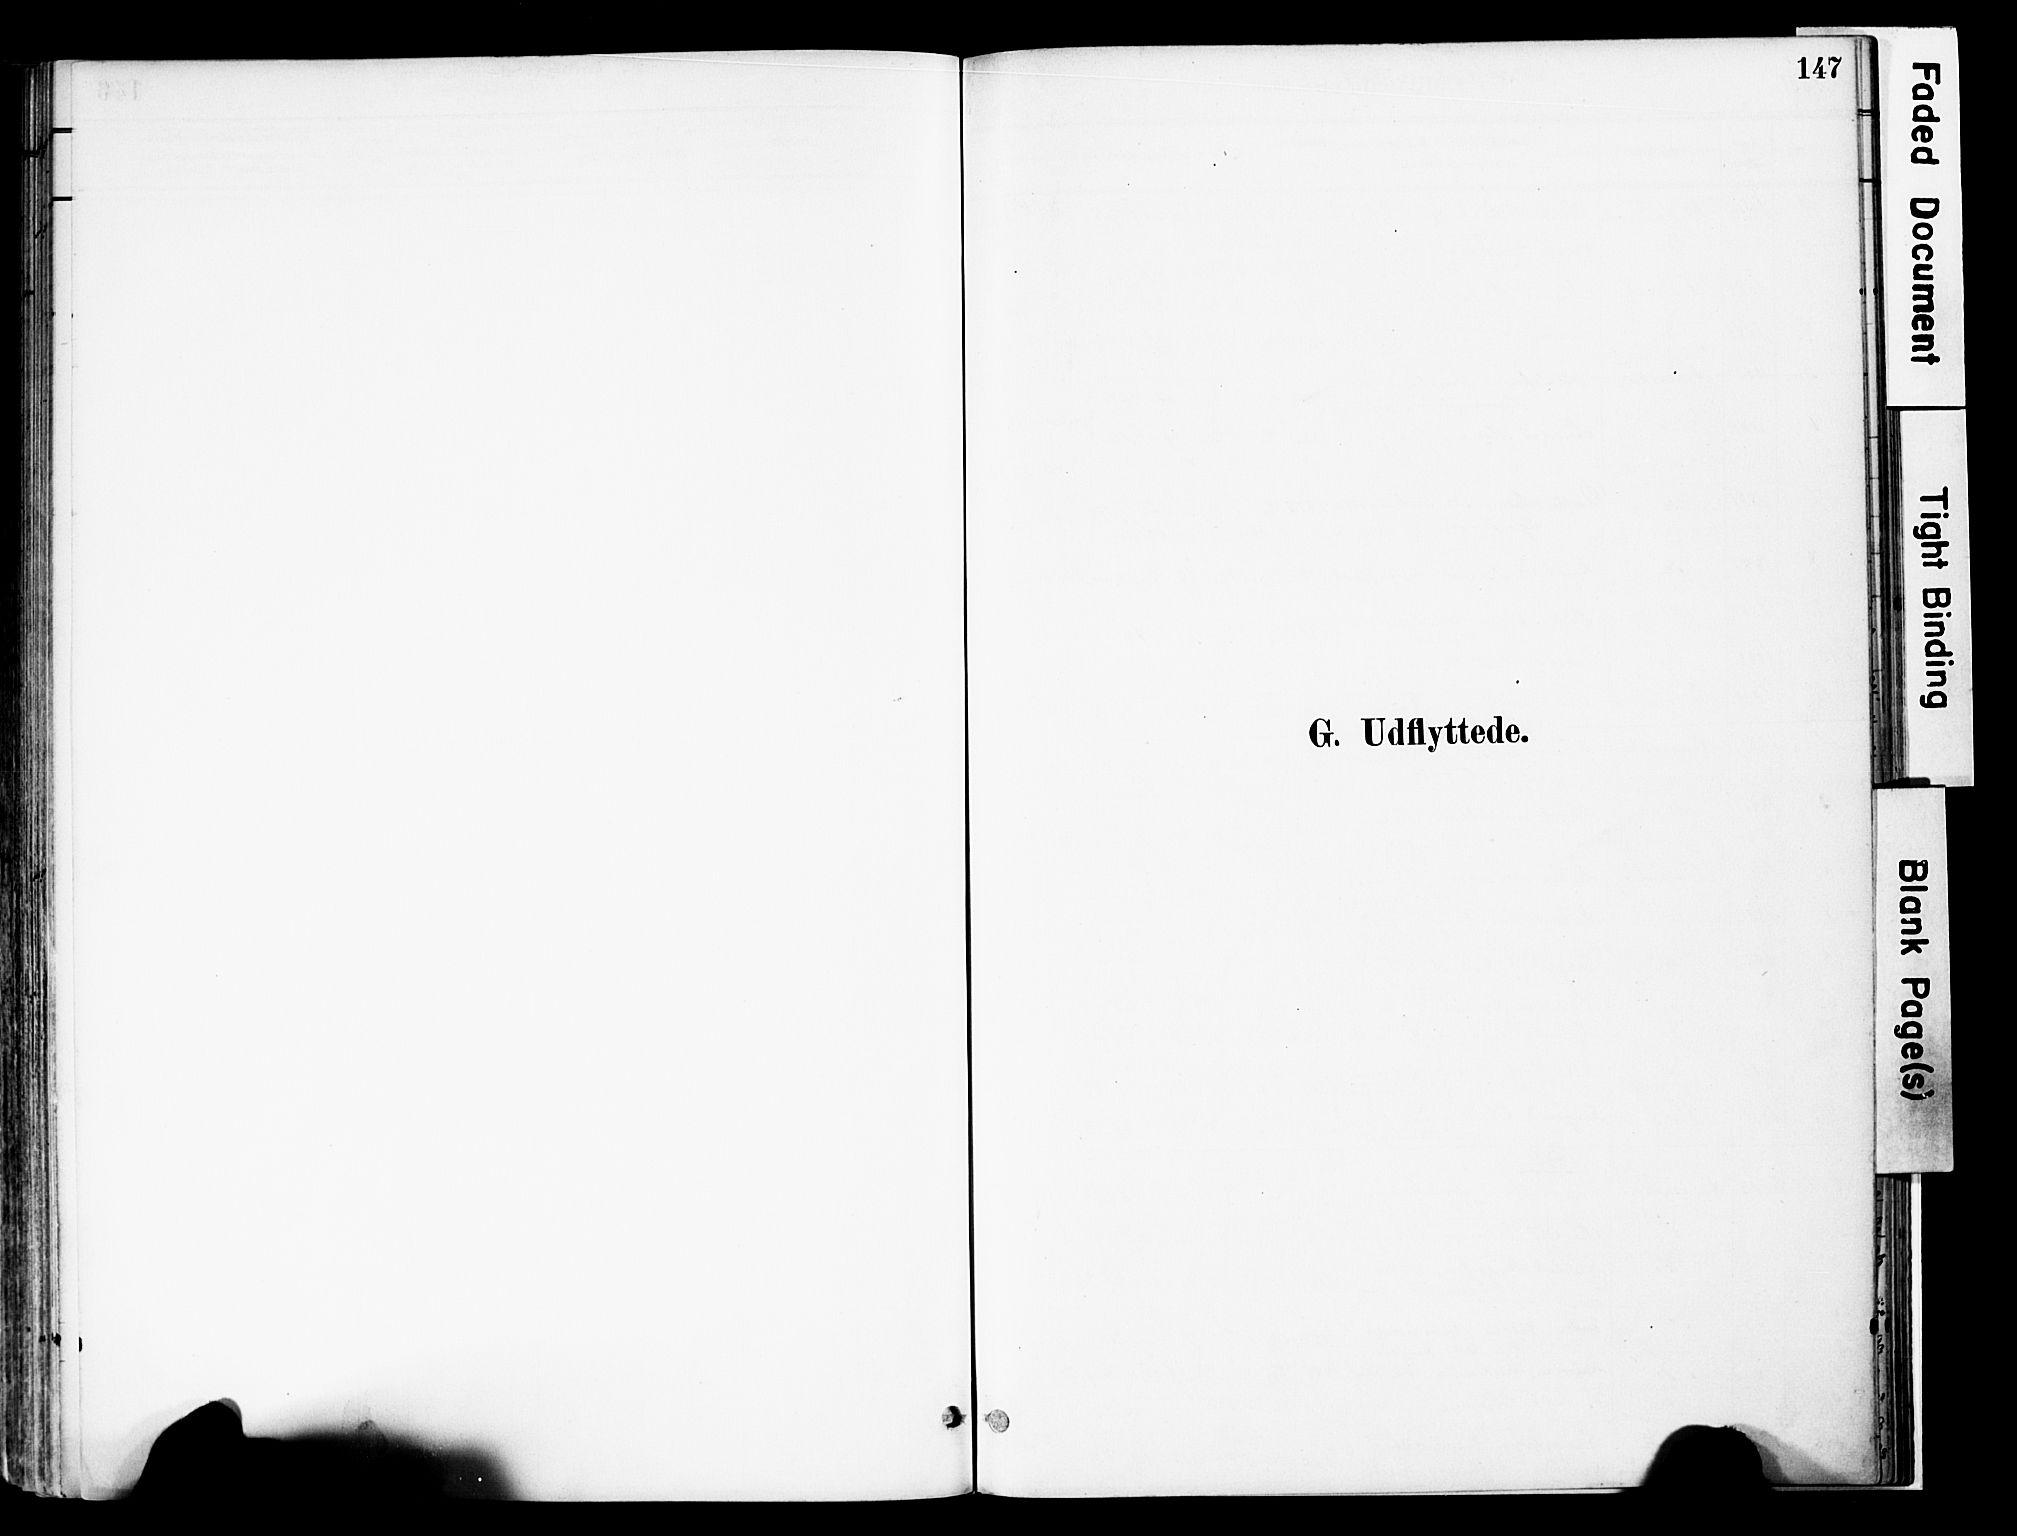 SAH, Vestre Slidre prestekontor, Ministerialbok nr. 6, 1881-1912, s. 147